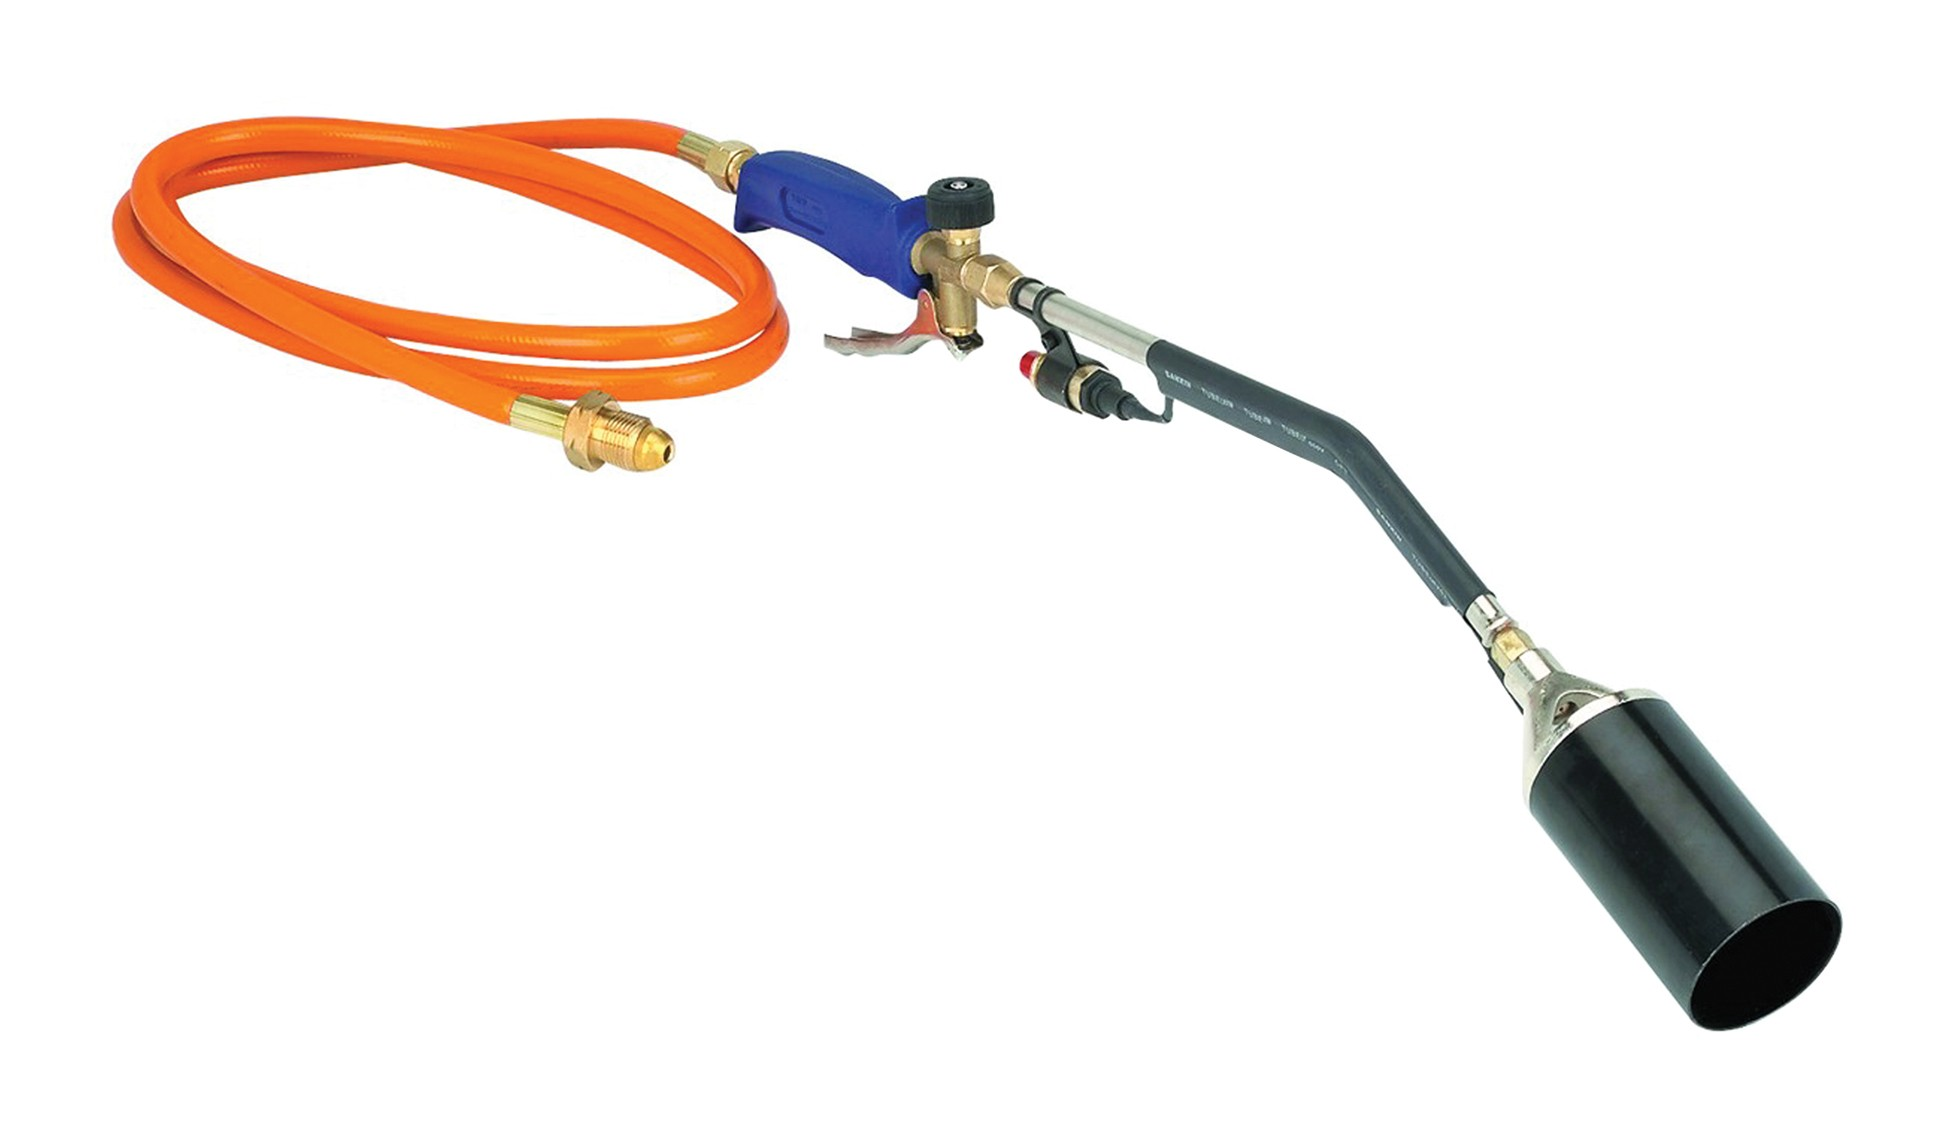 Liquid Propane Gas Turbo Blast Torch w/ Ignitor, SOLD-0015 | PMC Supplies